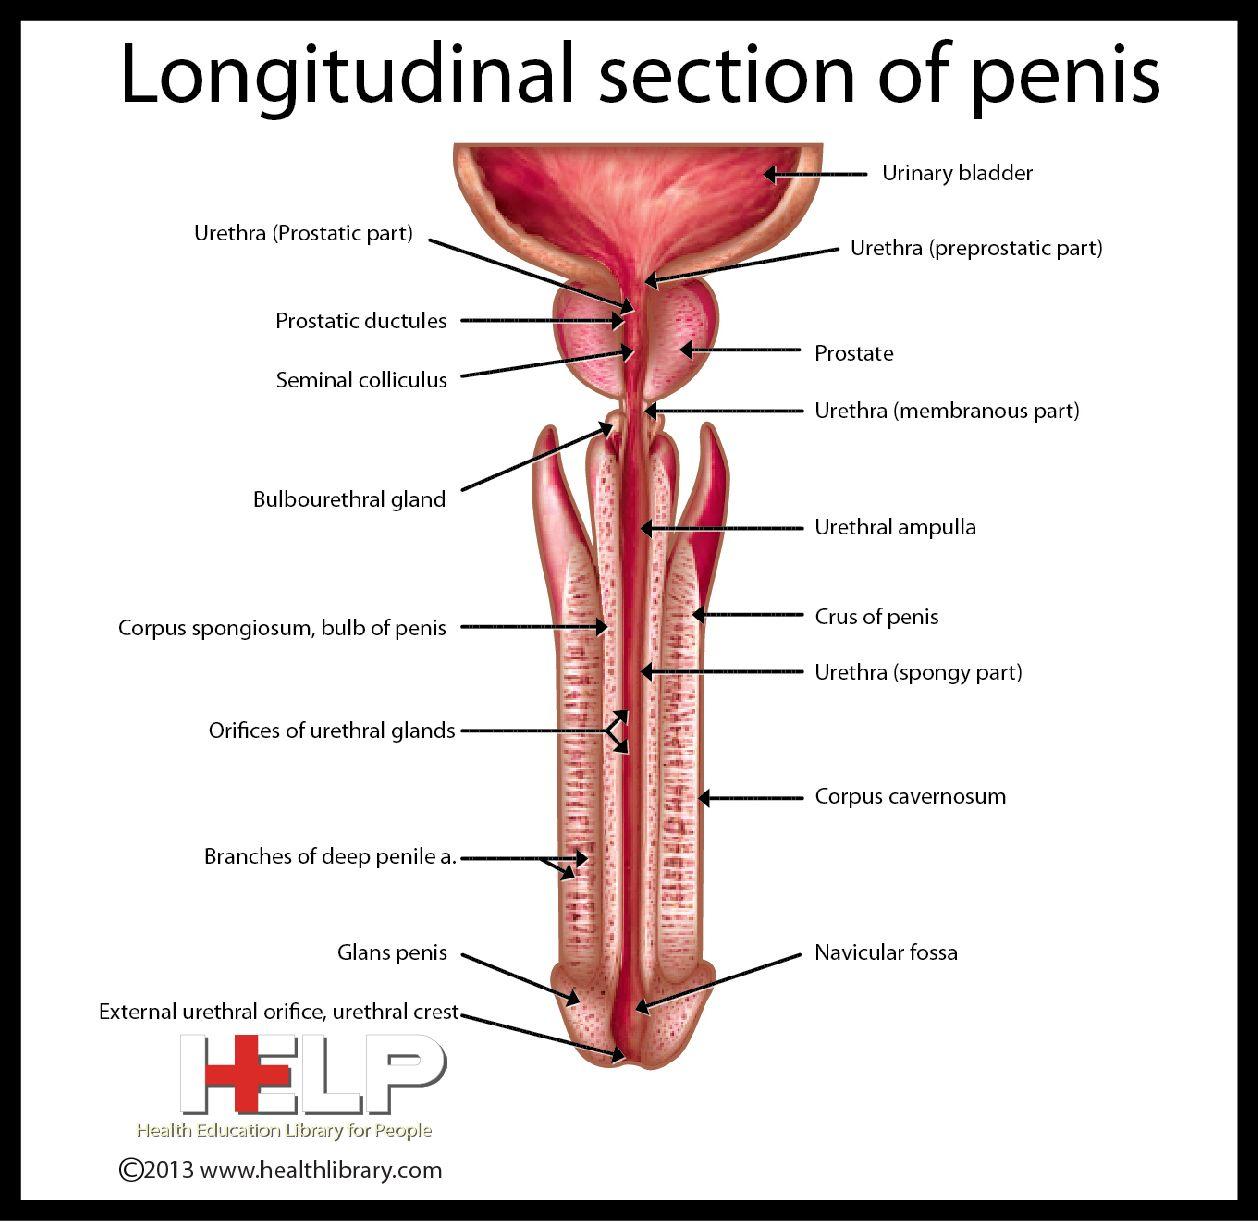 Longitudinal Section Of Penis | Anatomy * | Pinterest | Health diet